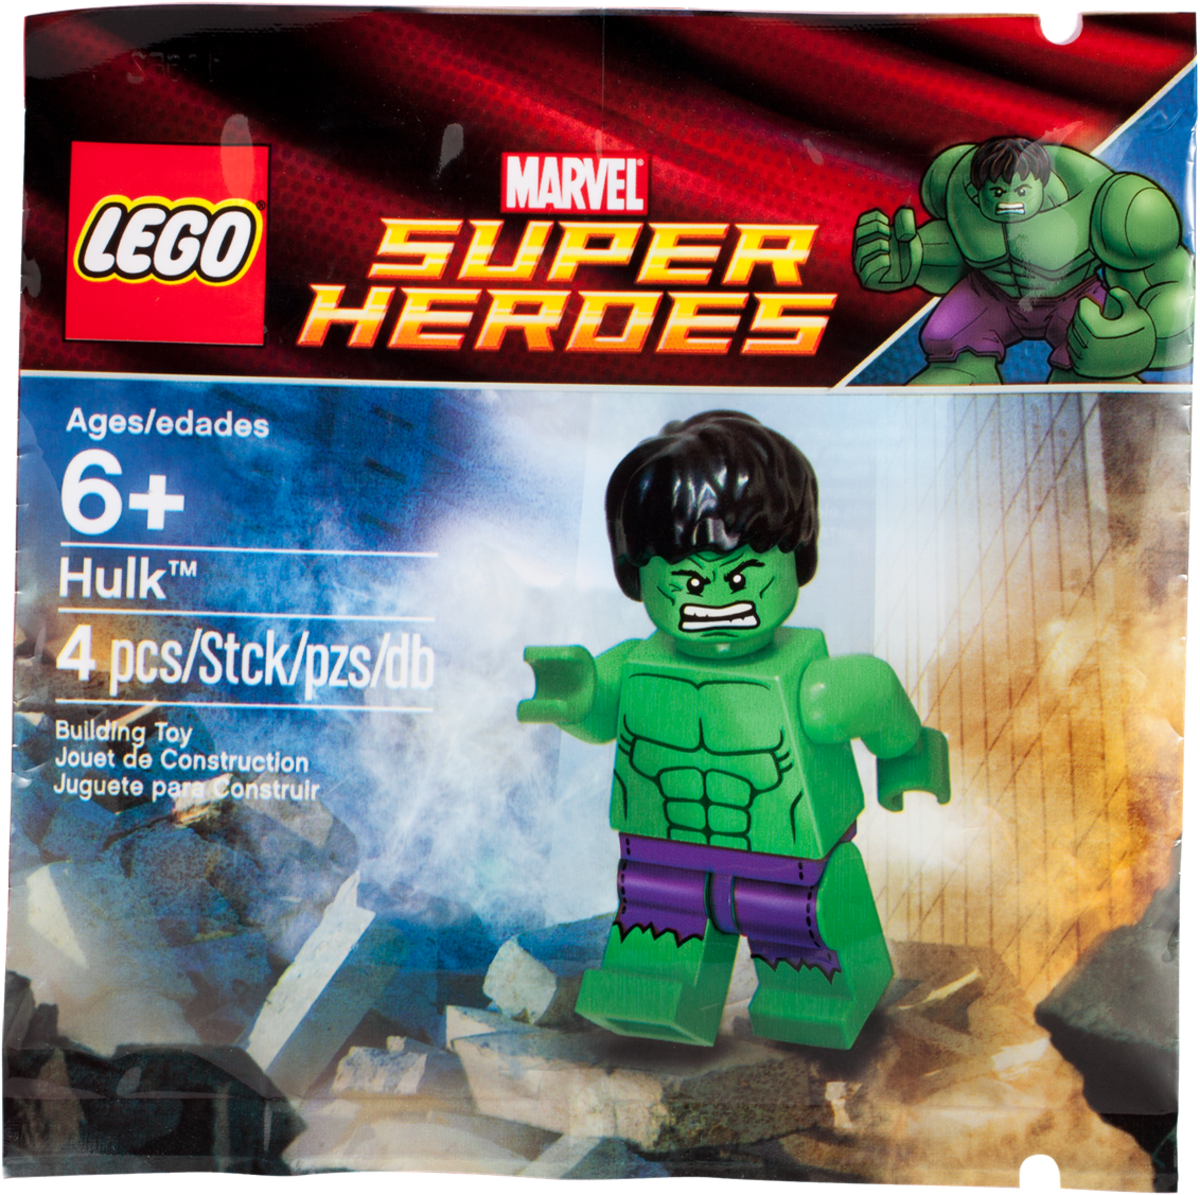 LEGO Super Heroes Hulk Minifigure 5000022 Polybag